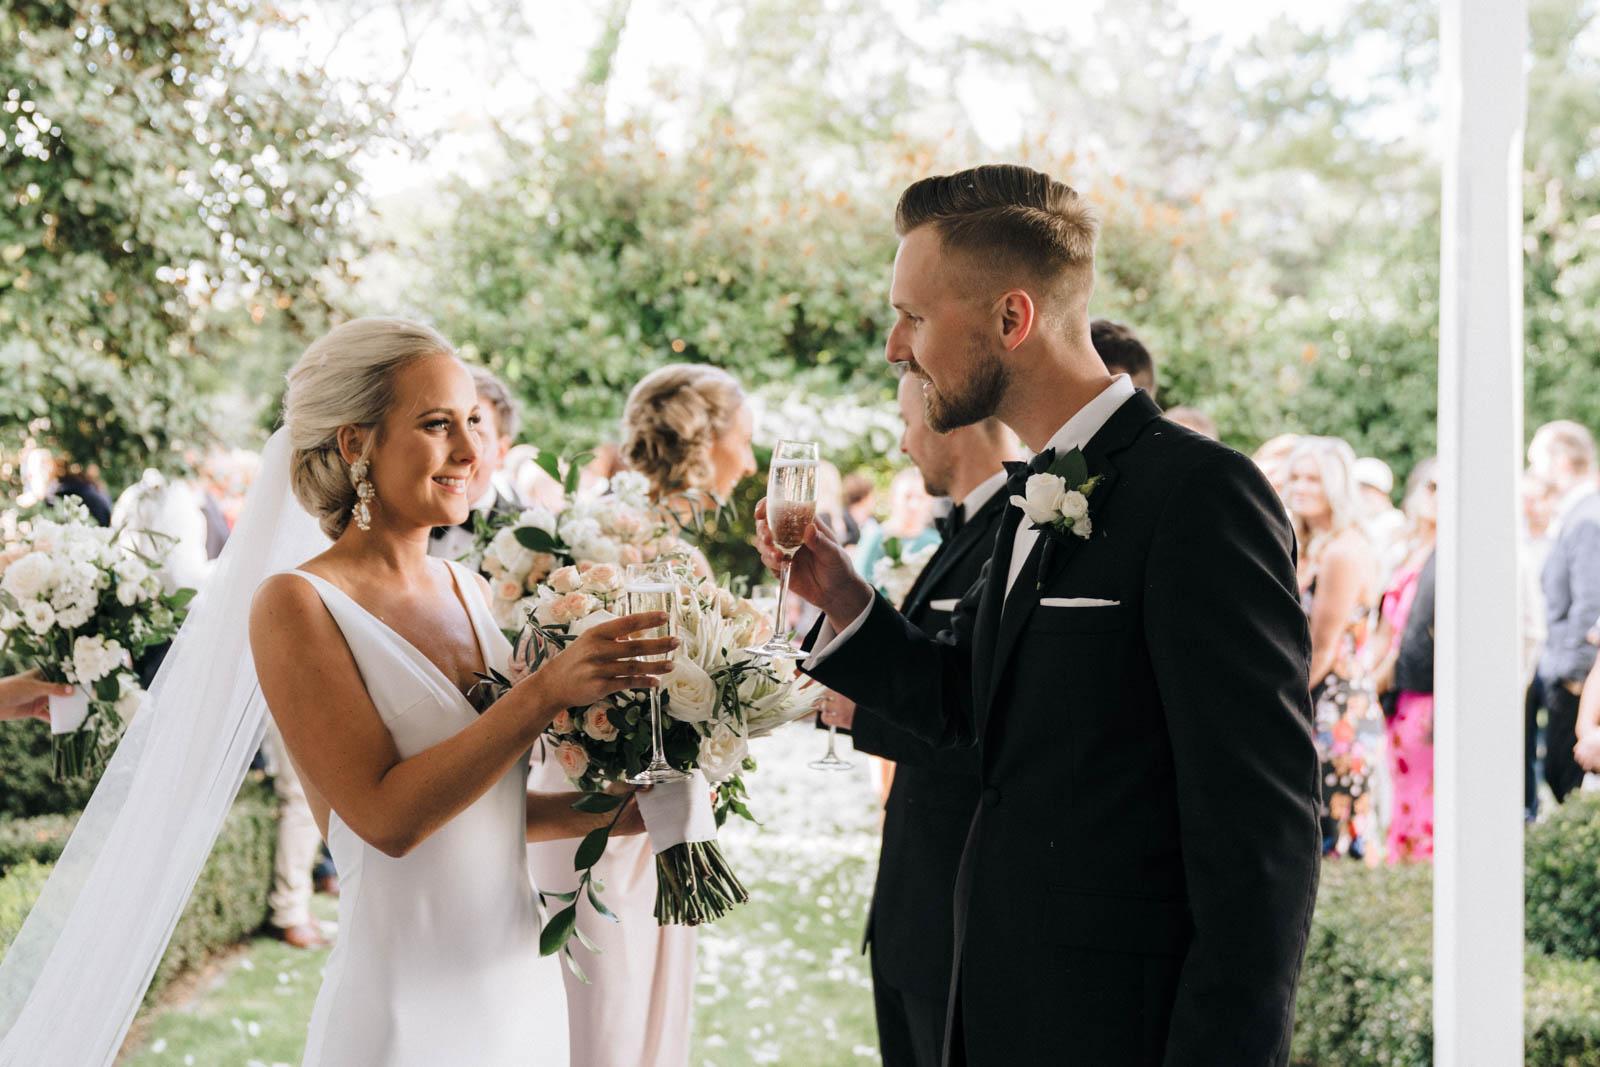 newfound-k-s-hilton-taupo-wedding-photographer-045